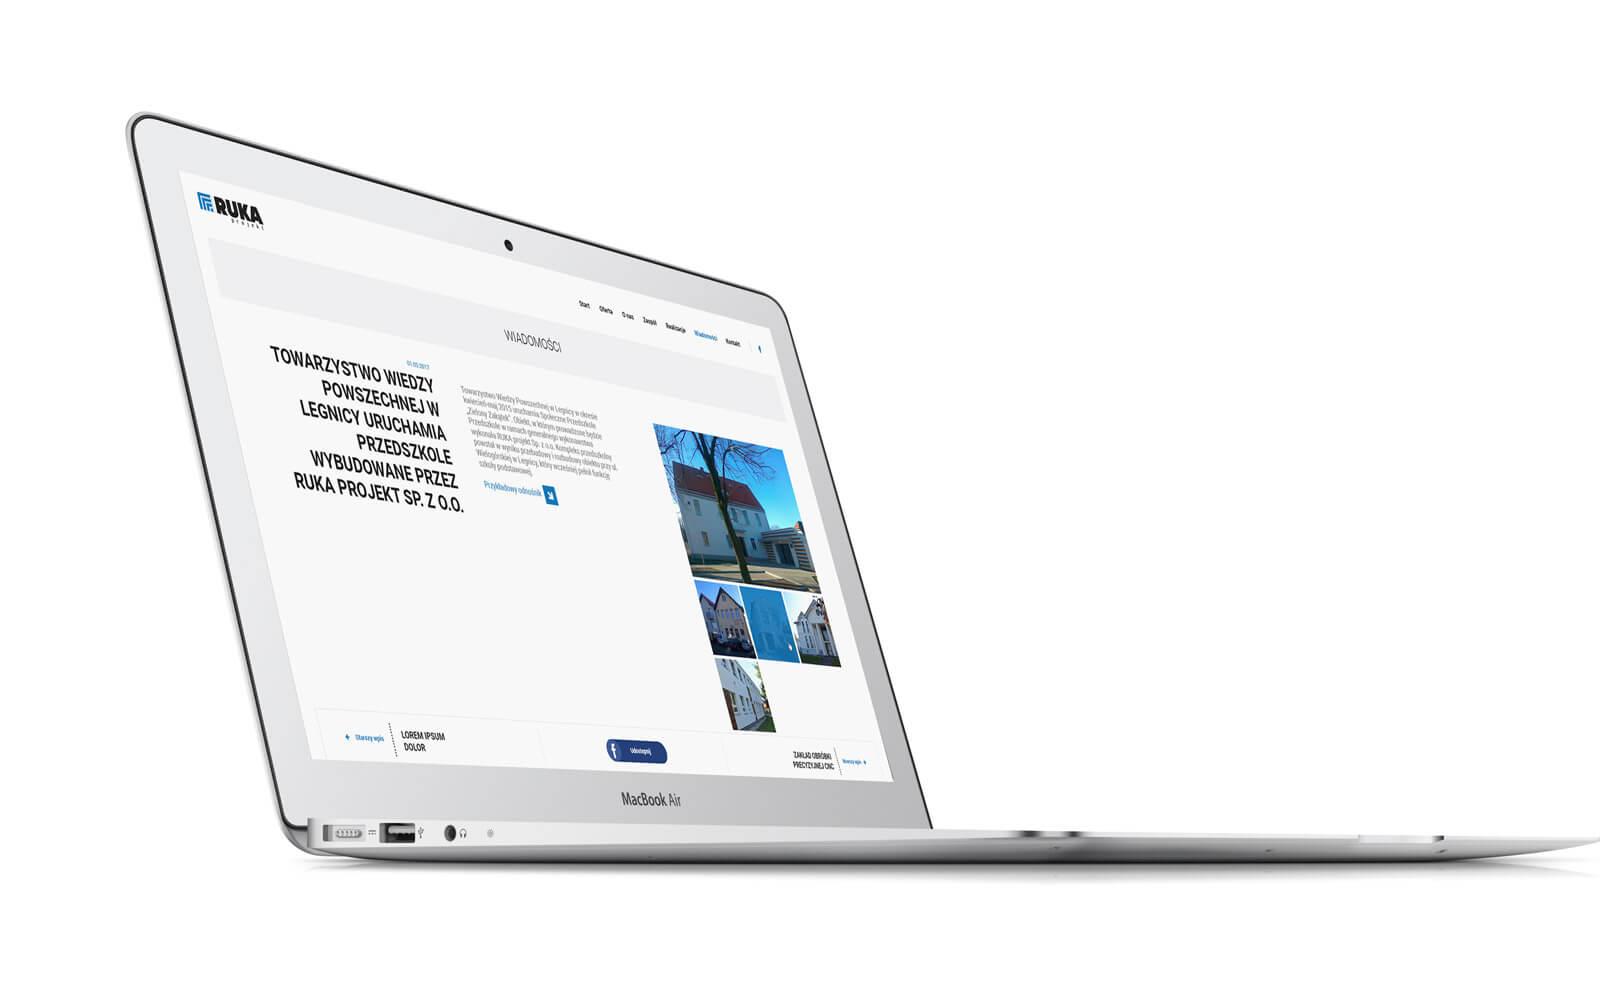 RUKA Projekt - laptop